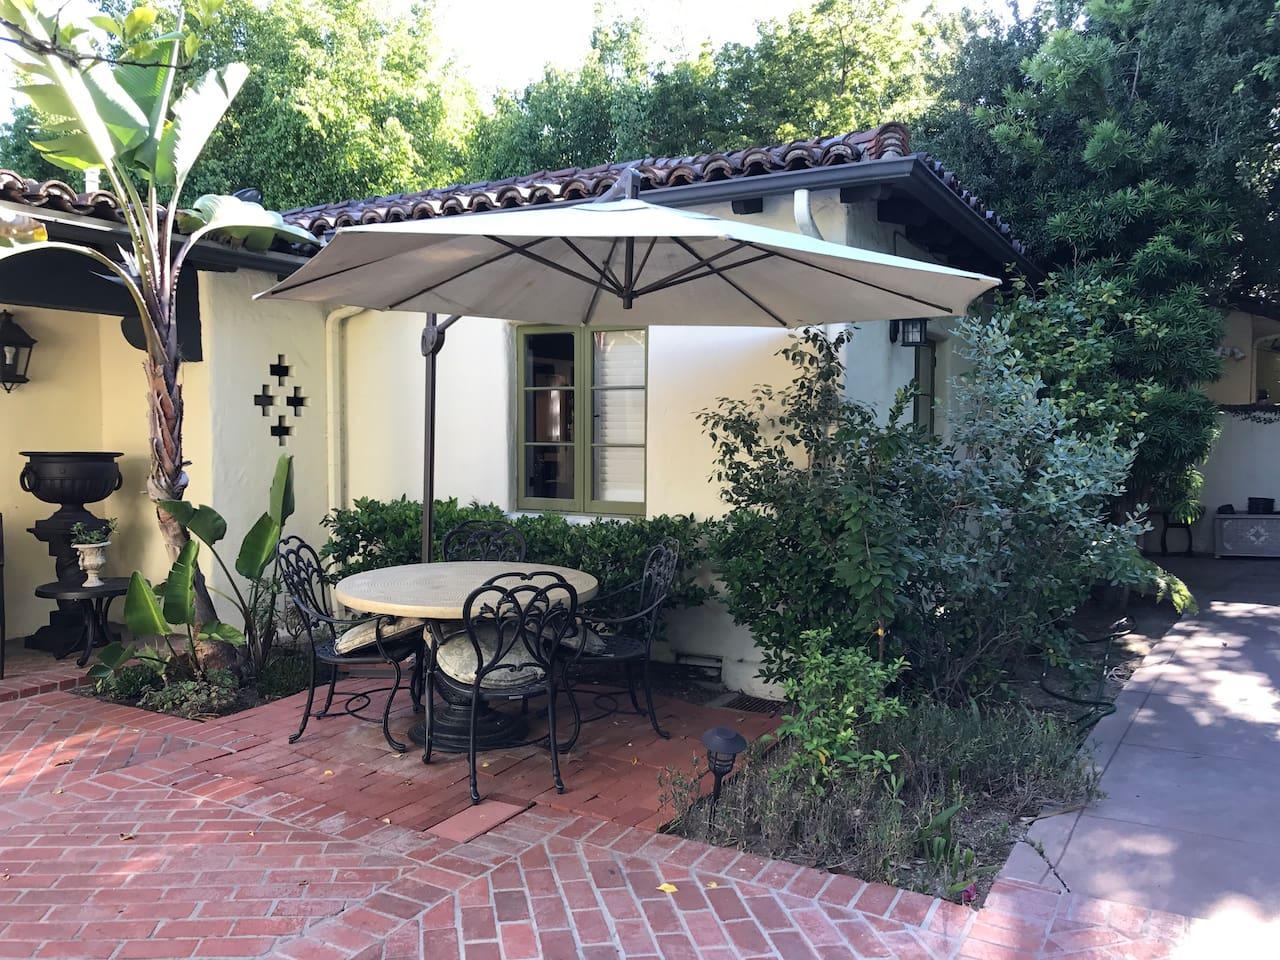 Guest's private patio 客人专用花园